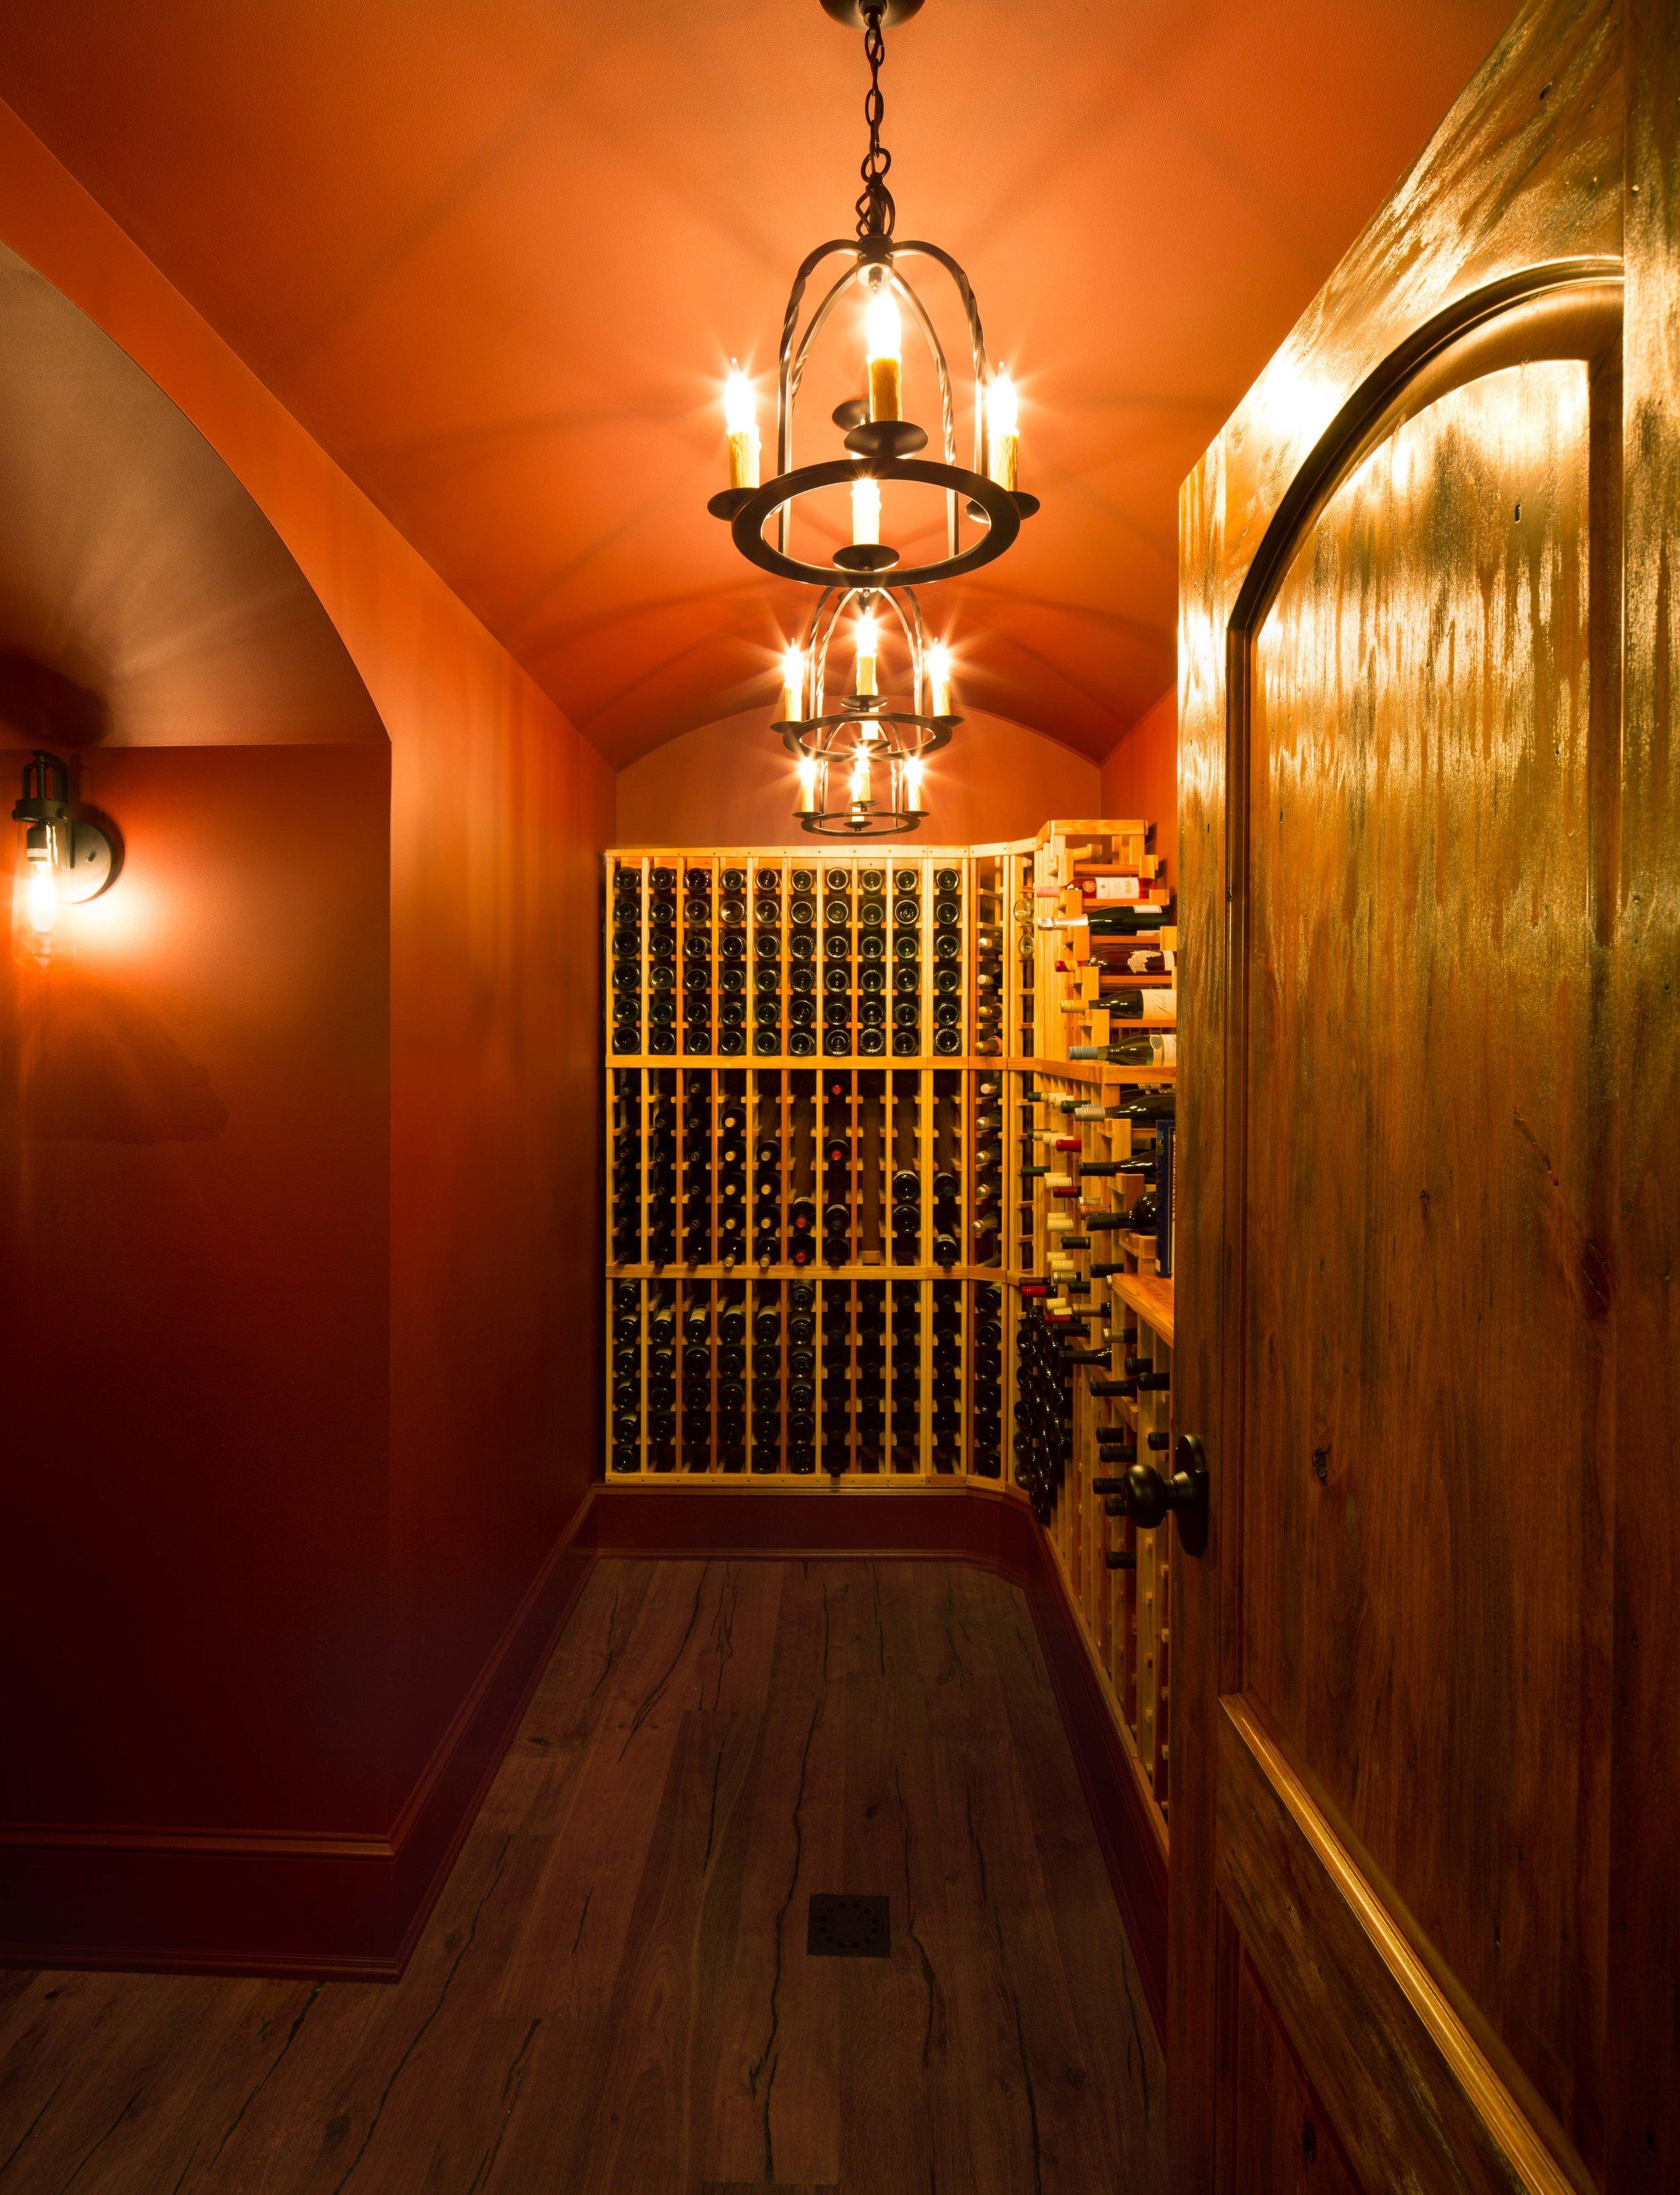 Corcoran-2629 Wine Cellar.jpg